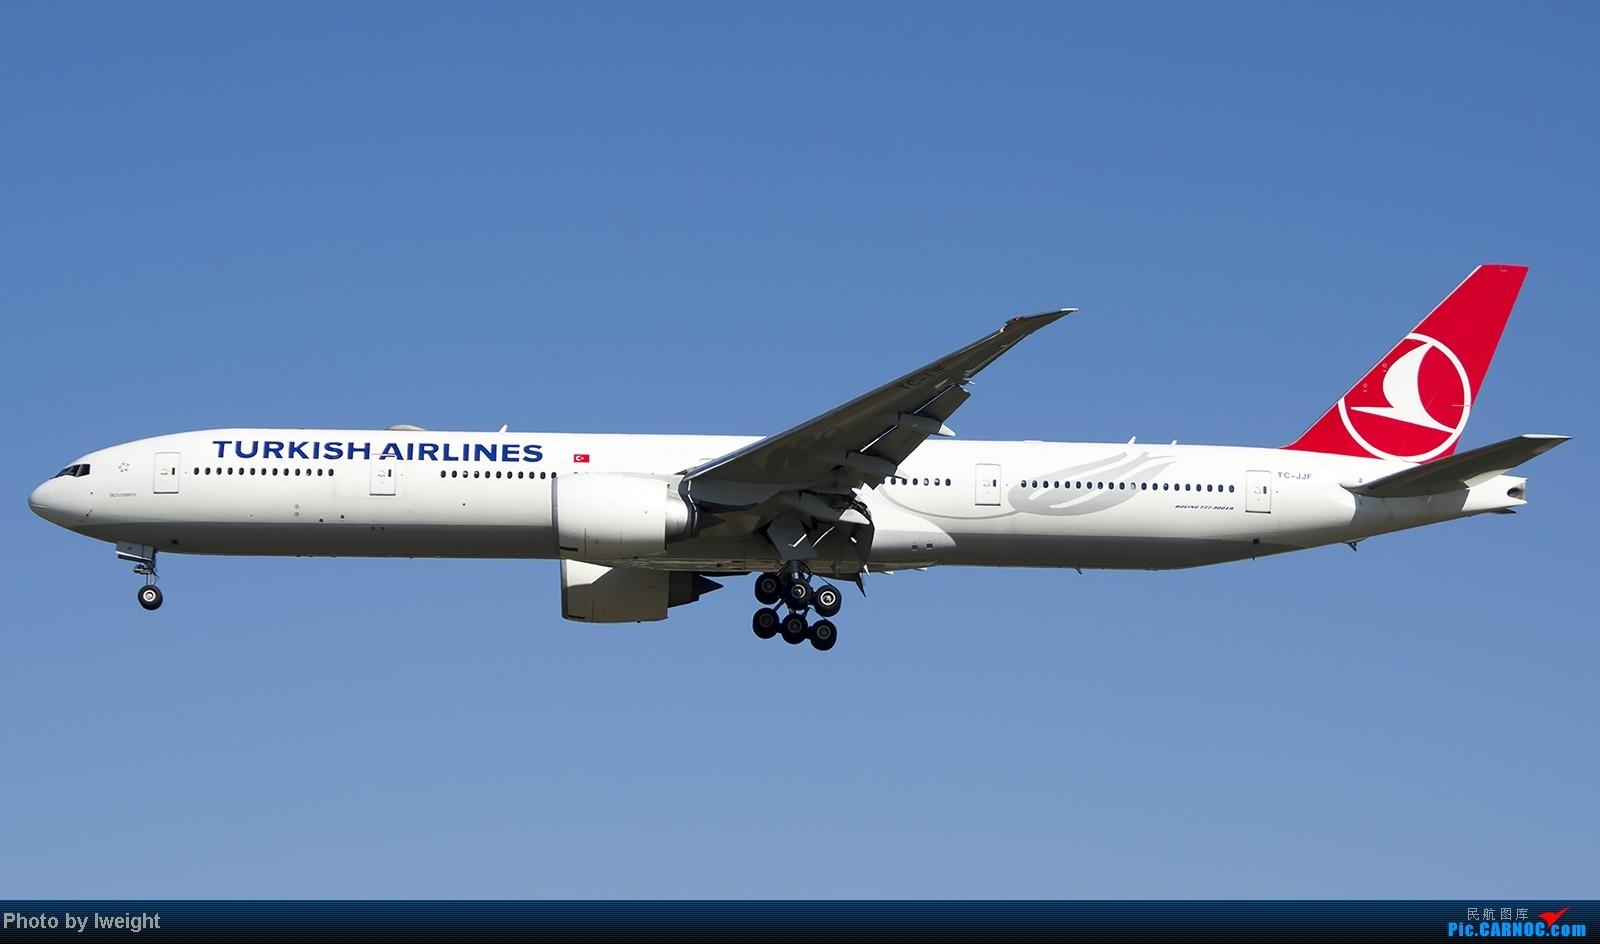 Re:[原创]难得赶上PEK周末好天气,各种常见机型都有收获 BOEING 777-300ER TC-JJF 中国北京首都机场